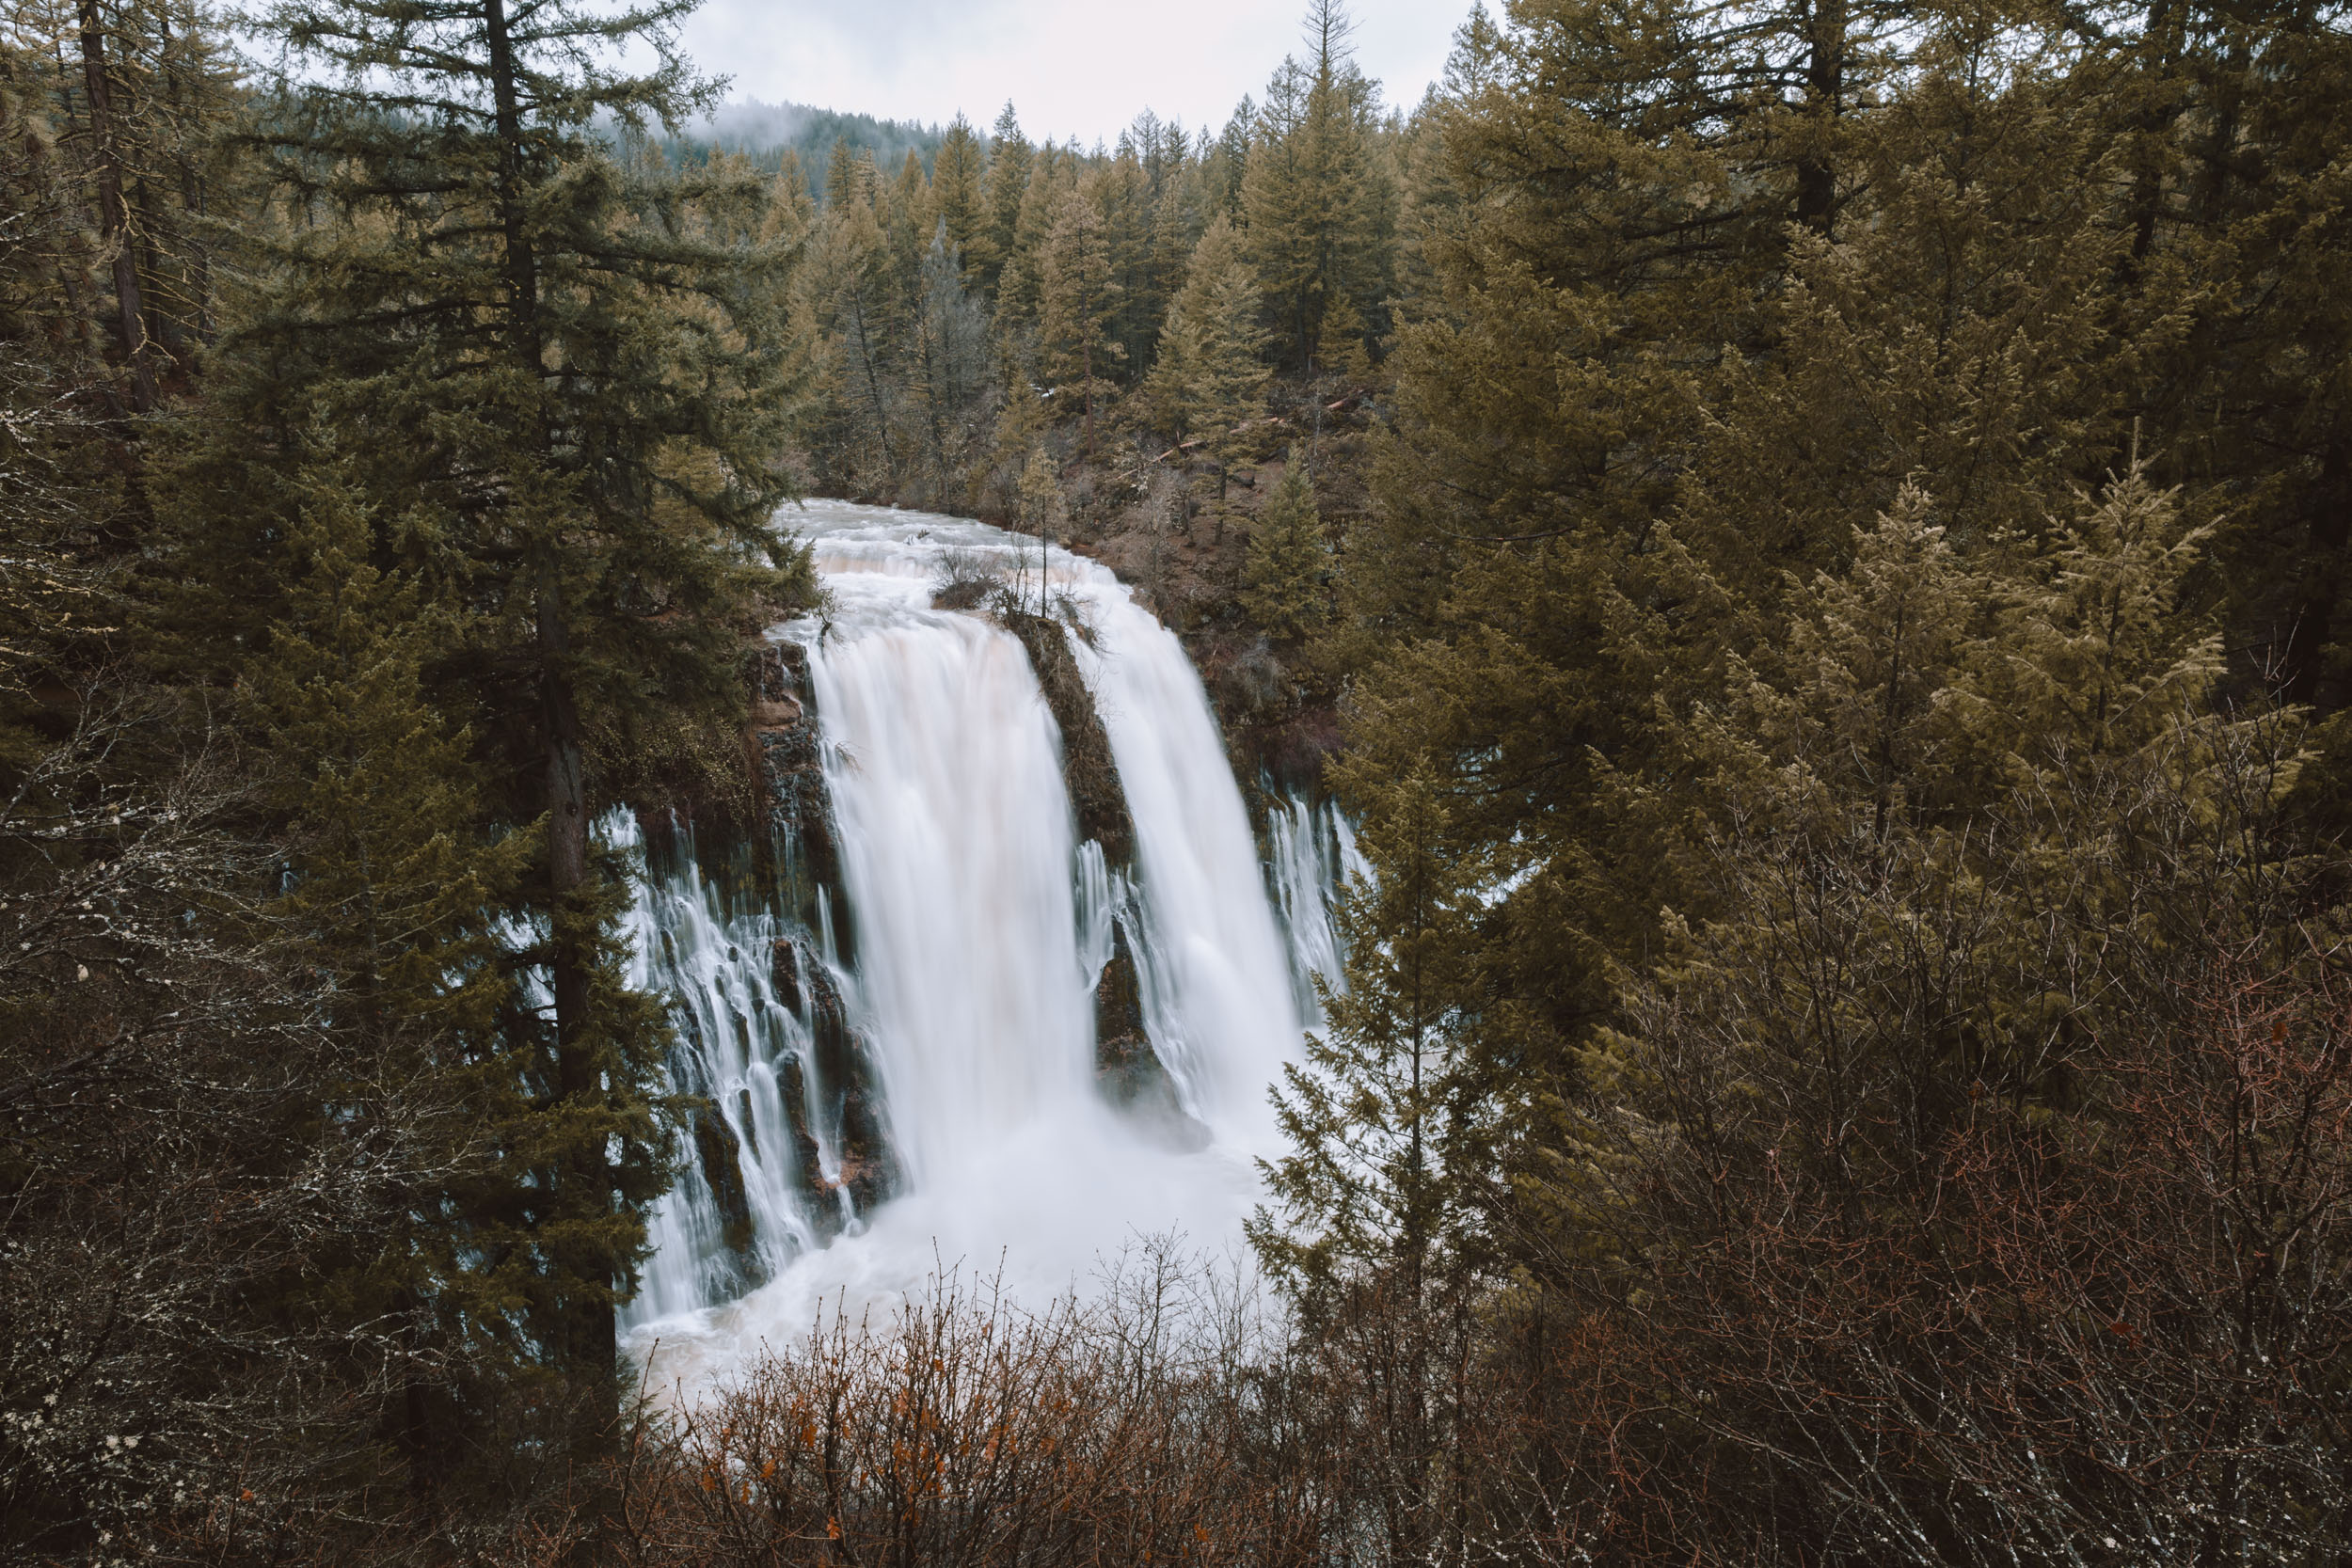 shasta-adventure-burney-falls-hike-and-shoot-1.jpg